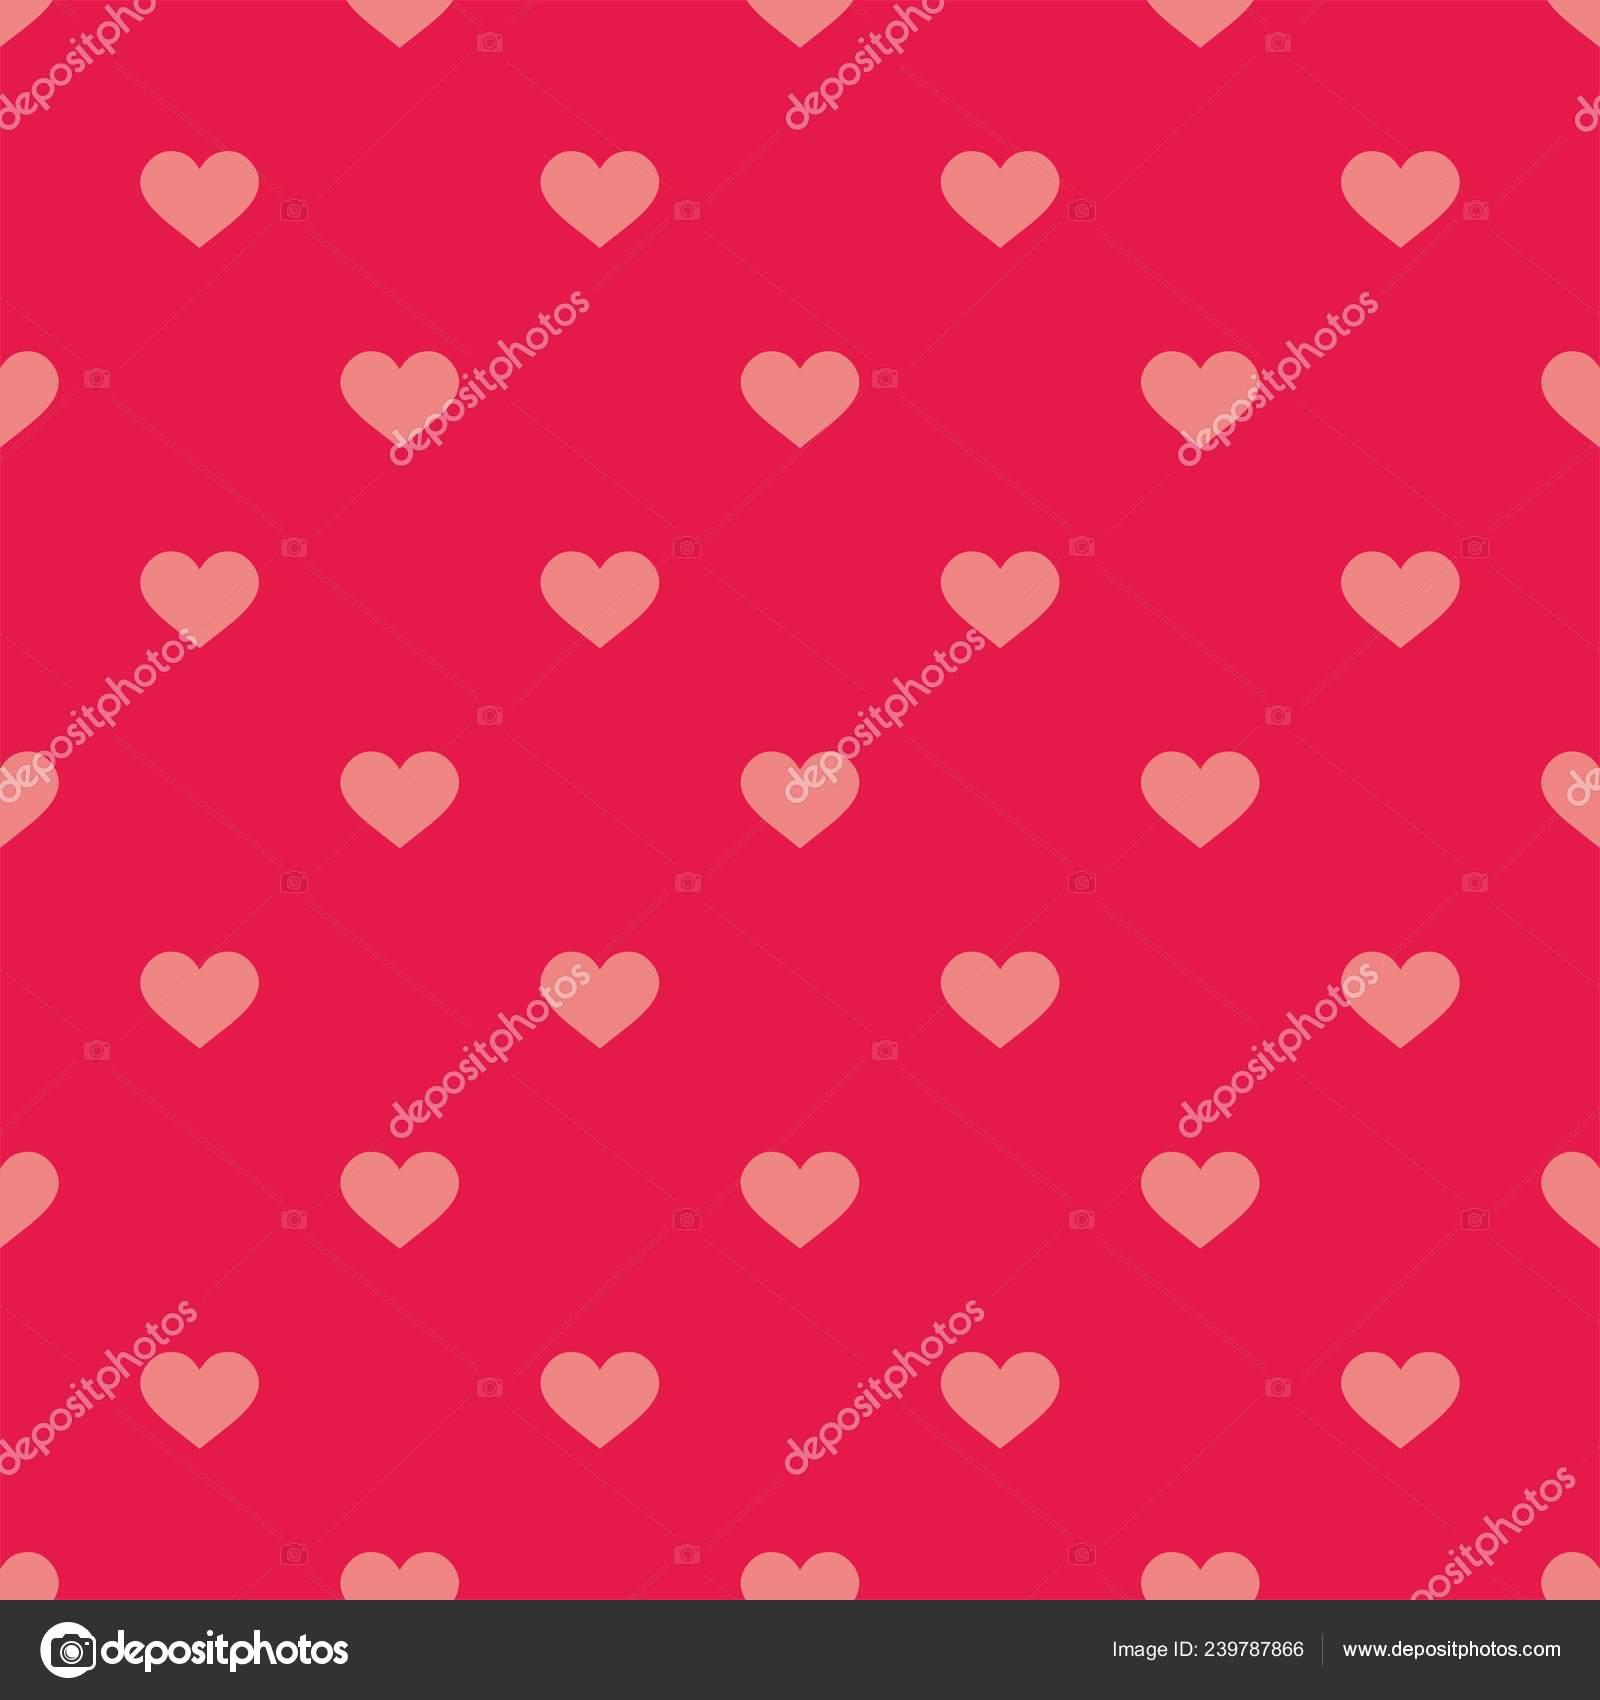 Background Desktop Cute Pink Vector Background Hearts